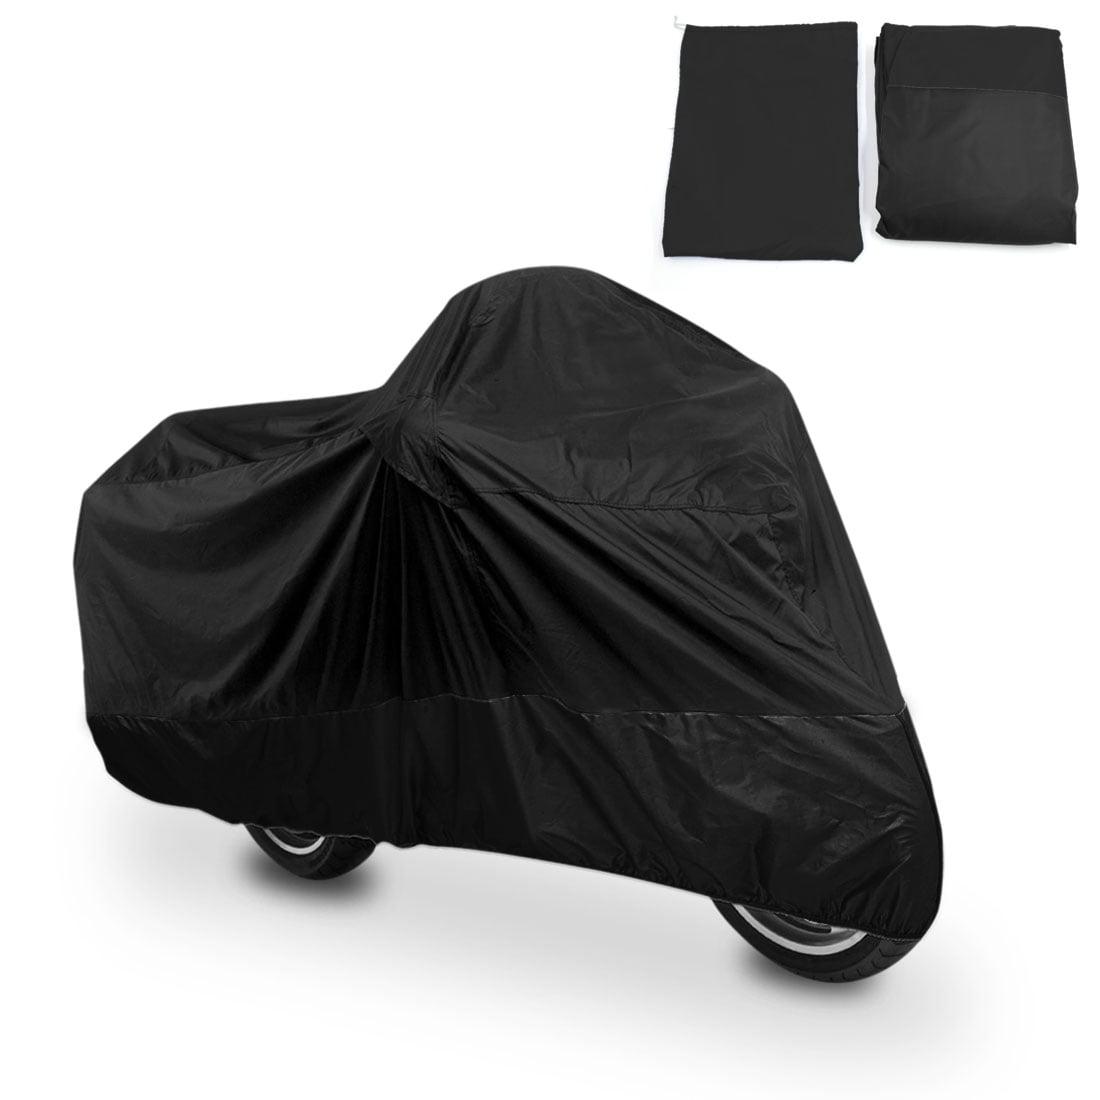 L Black+Silver Motorcycle Cover For Suzuki Katana GSXR 600 750 1000 TL1000R